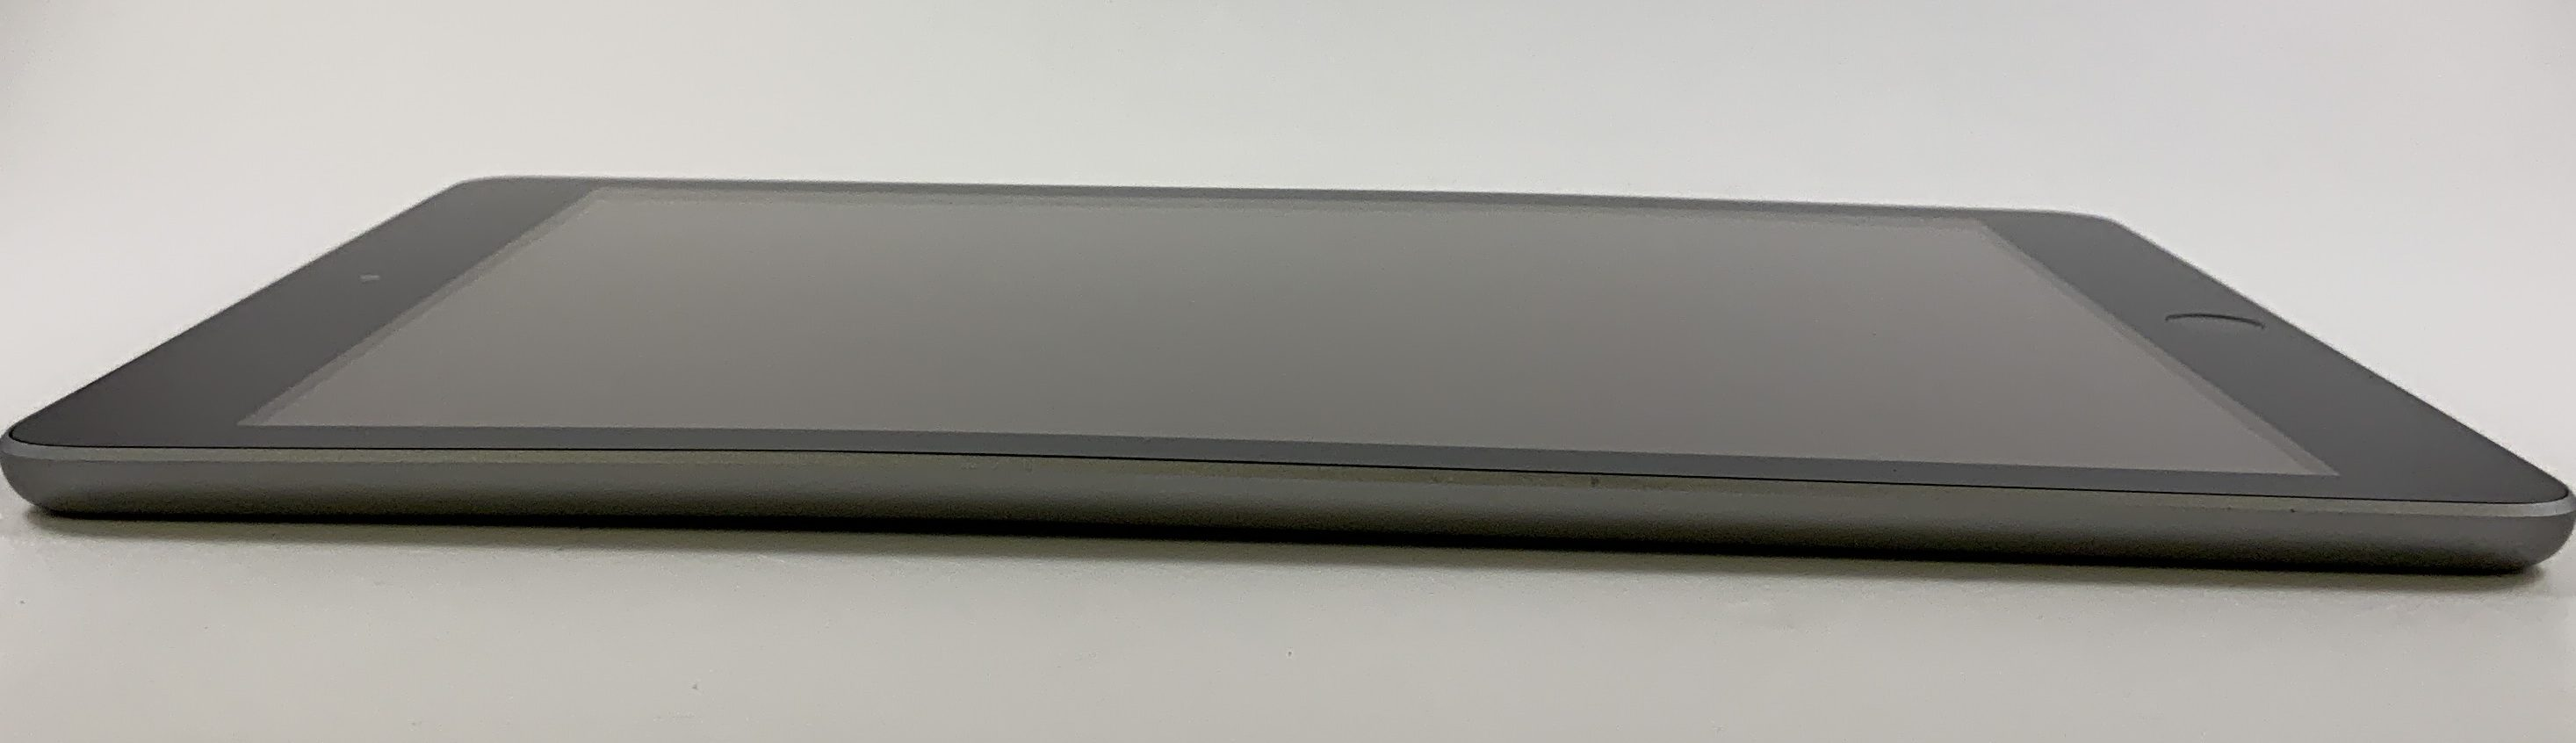 iPad 5 Wi-Fi + Cellular 128GB, 128GB, Space Gray, Kuva 6